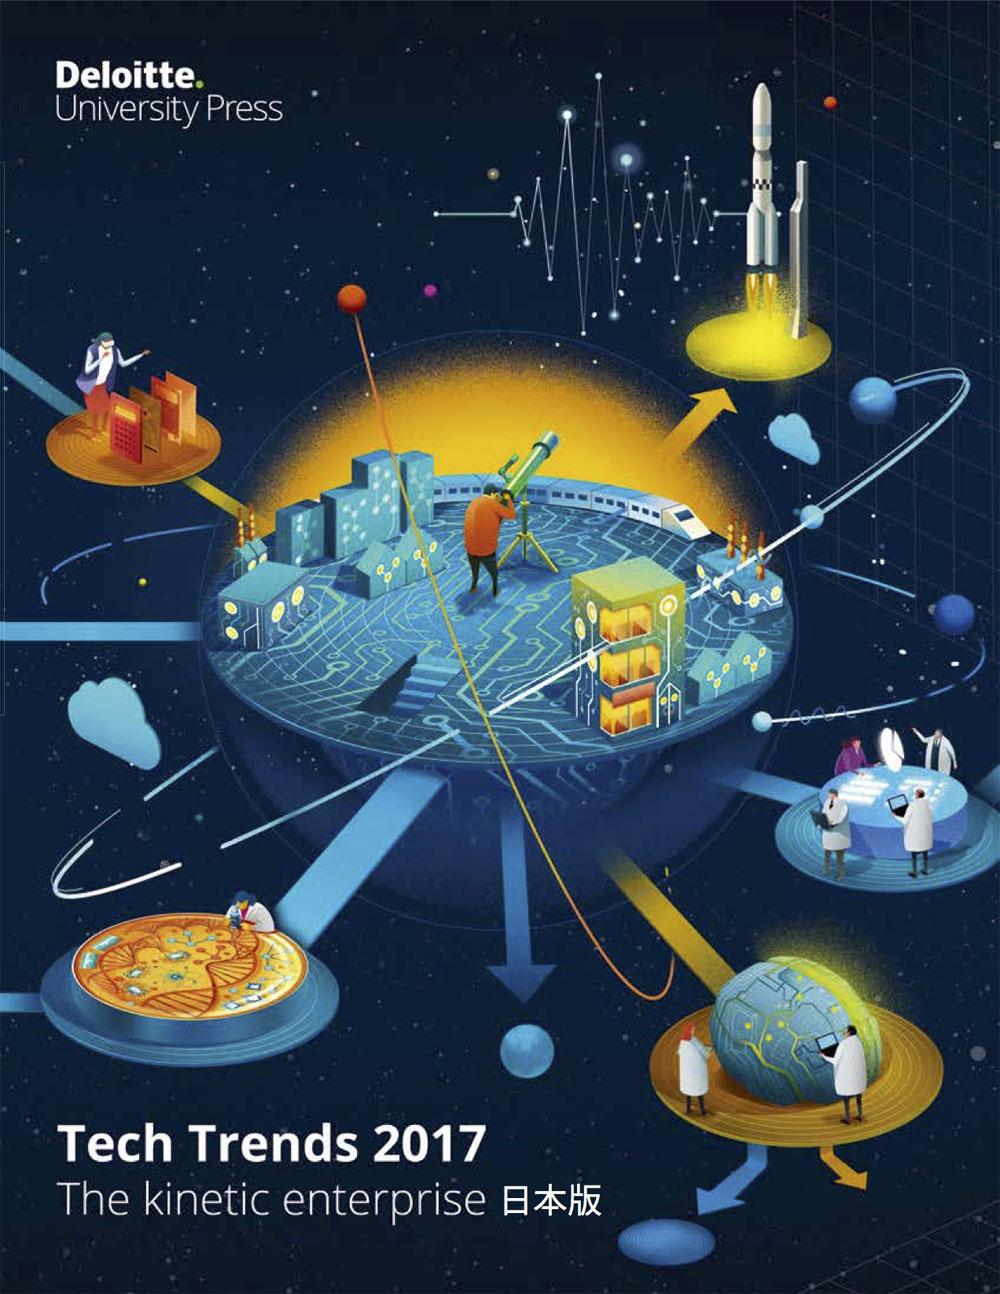 「Tech Trends 2017日本版」の表紙